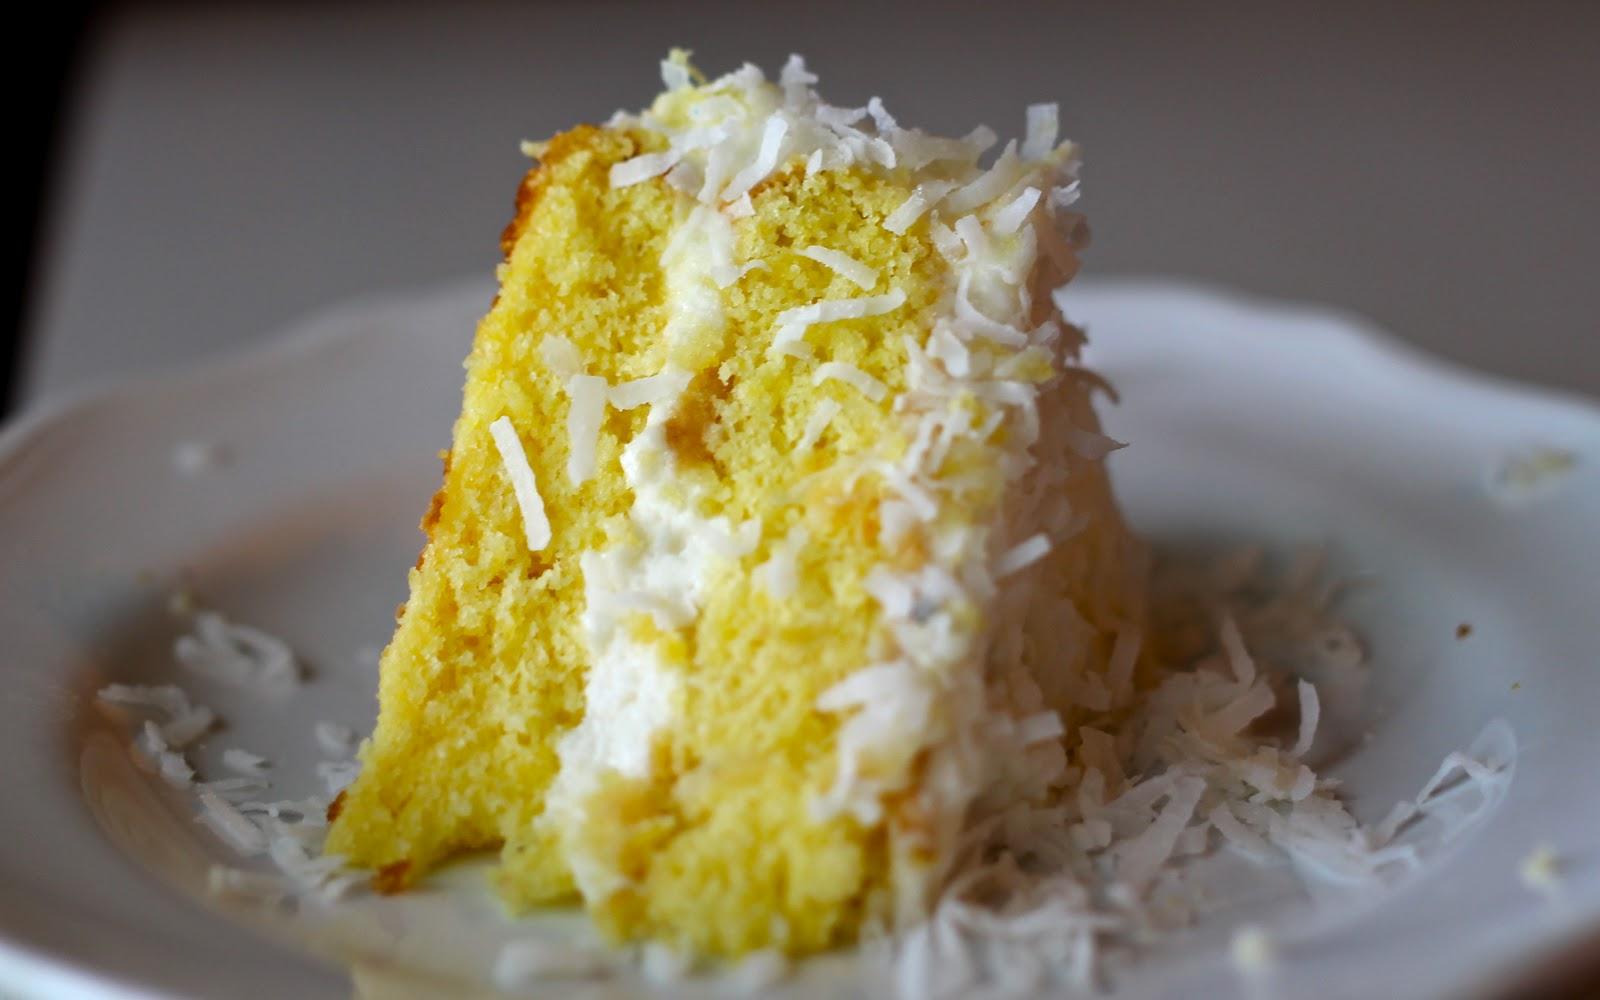 Pina Colada Cake Yammie's noshery: piña colada cake